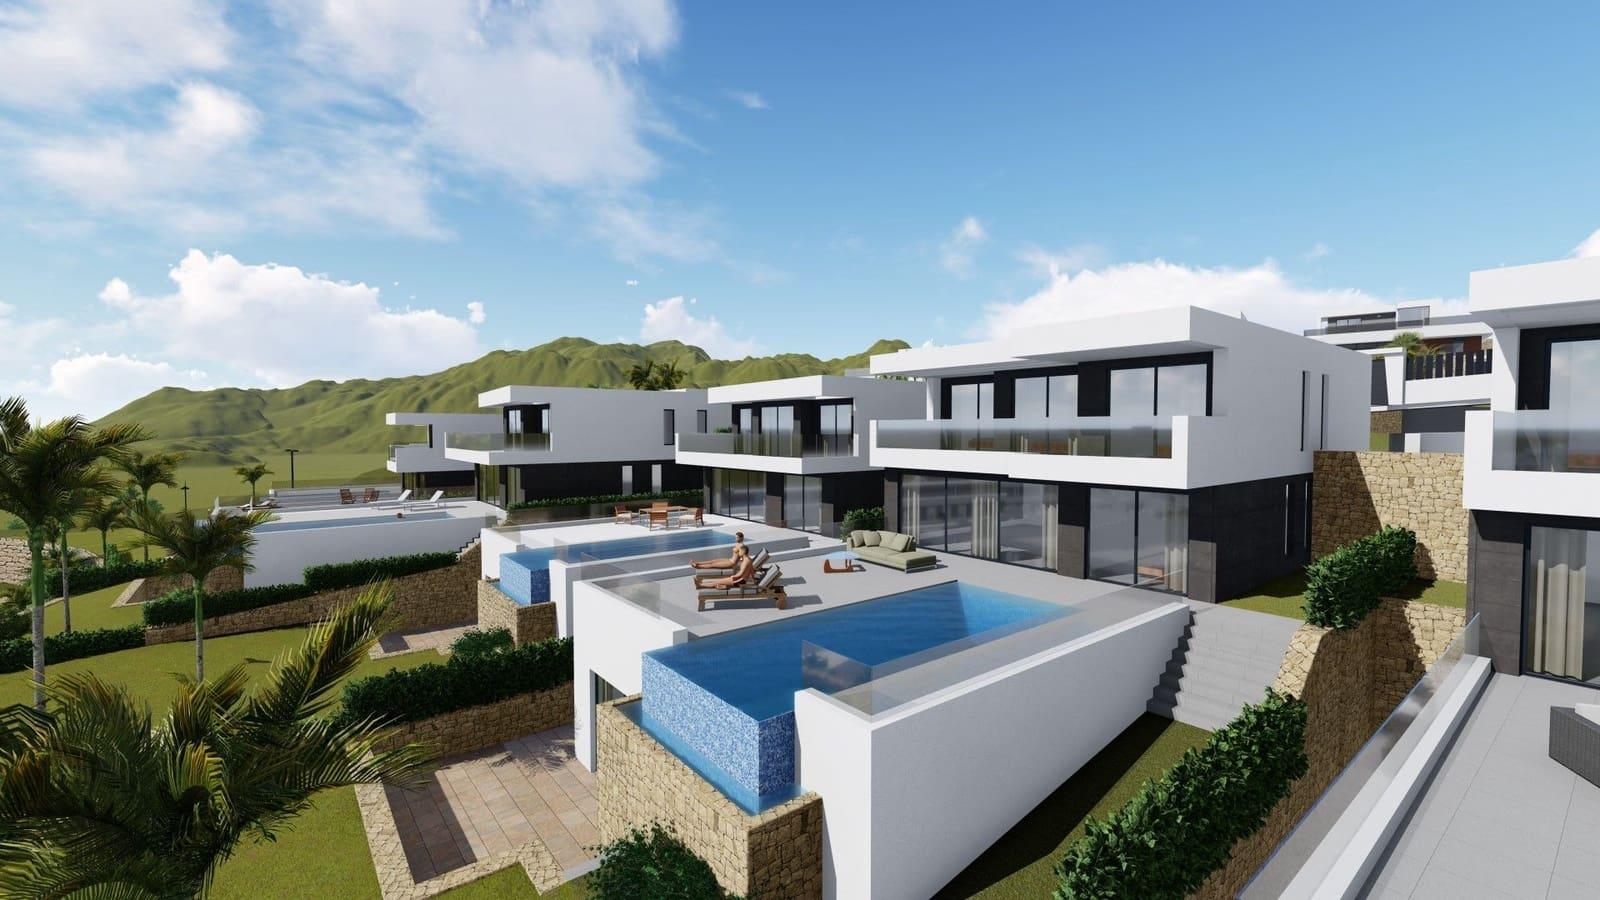 4 bedroom Villa for sale in Finestrat with pool garage - € 680,000 (Ref: 6249903)